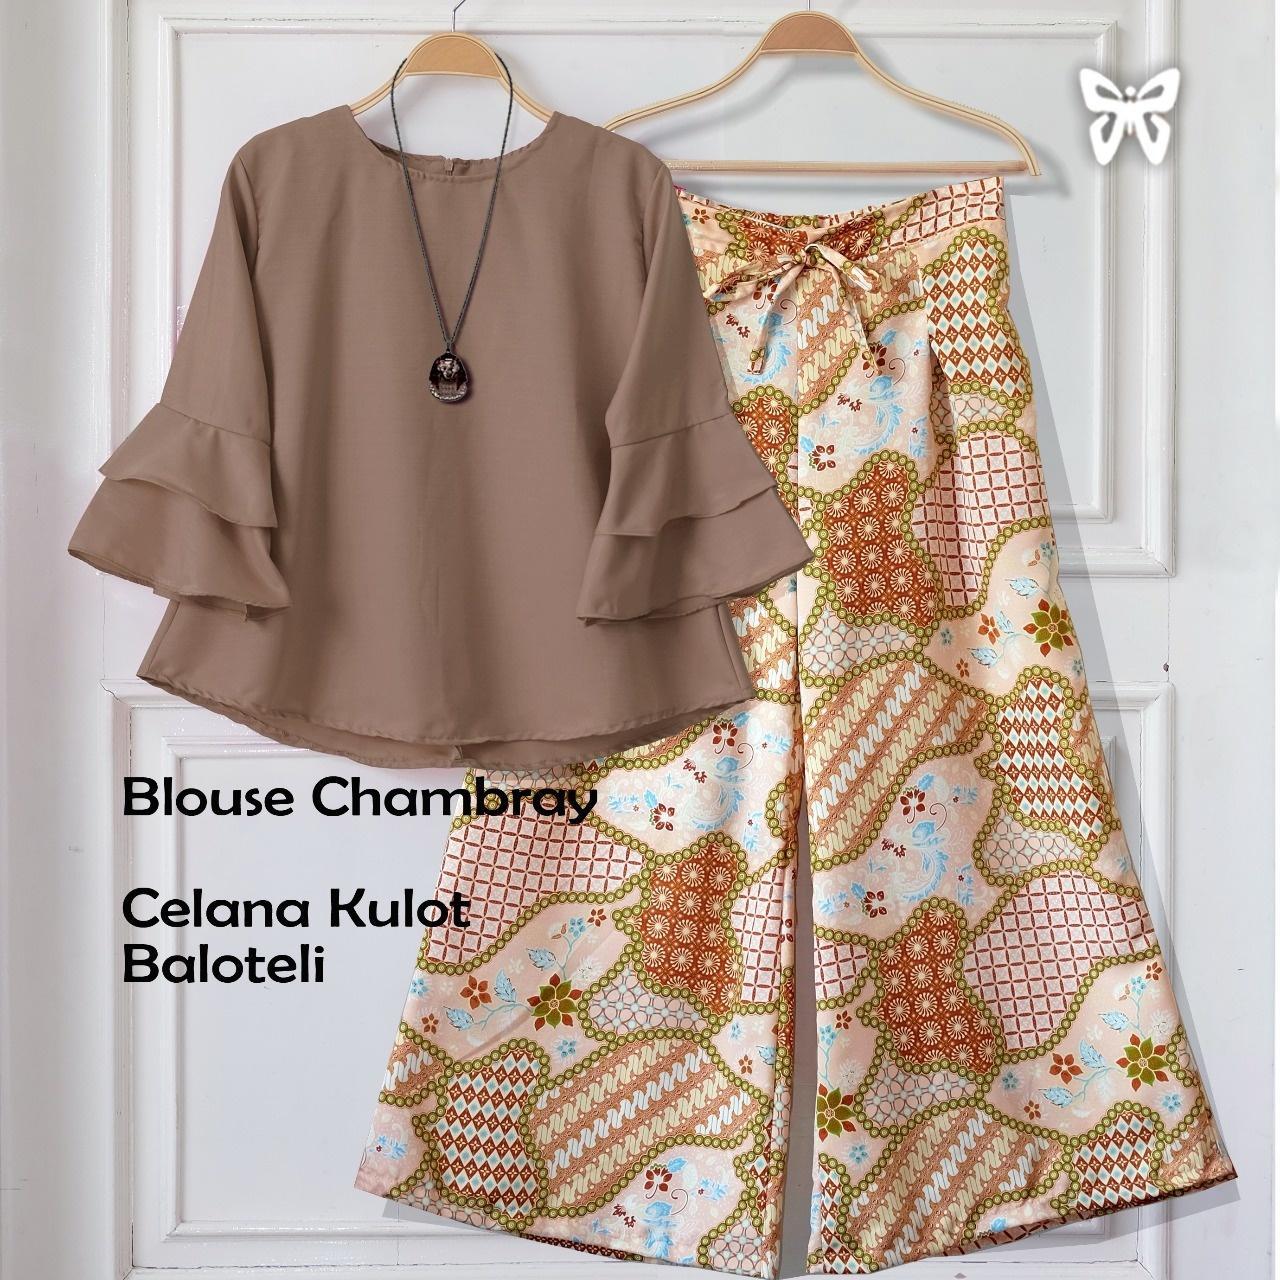 Flavia Store Setelan Wanita Batik FS0285 - COKLAT MOCCA / Stelan Muslimah / Atasan Baju Blouse Kemeja Lengan Panjang Terompet Bawahan Celana Kulot Muslim / Srshania